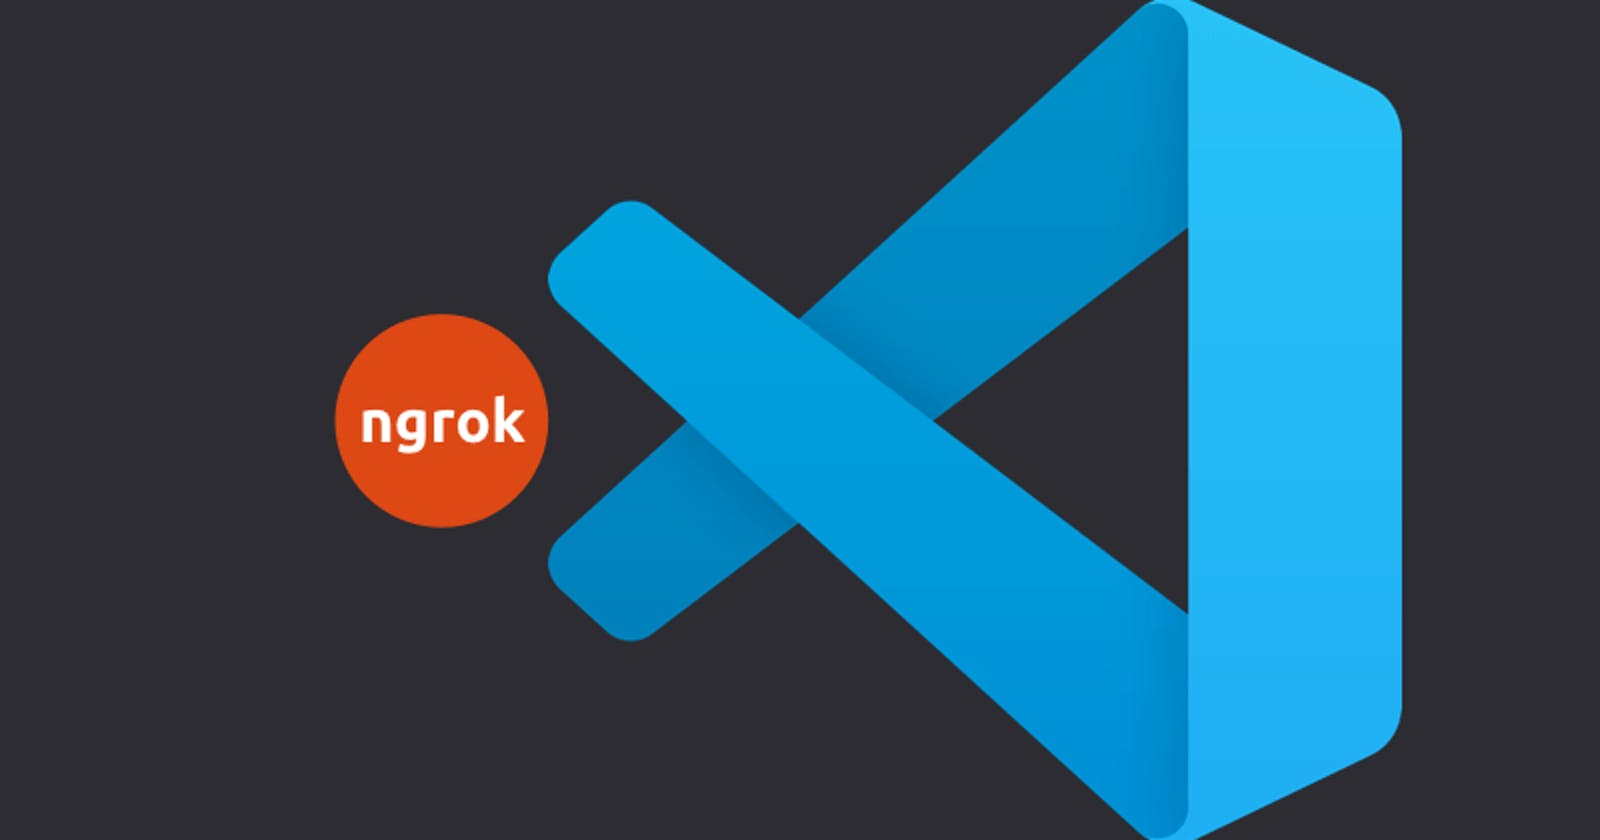 I built a VSCode extension: ngrok for VSCode